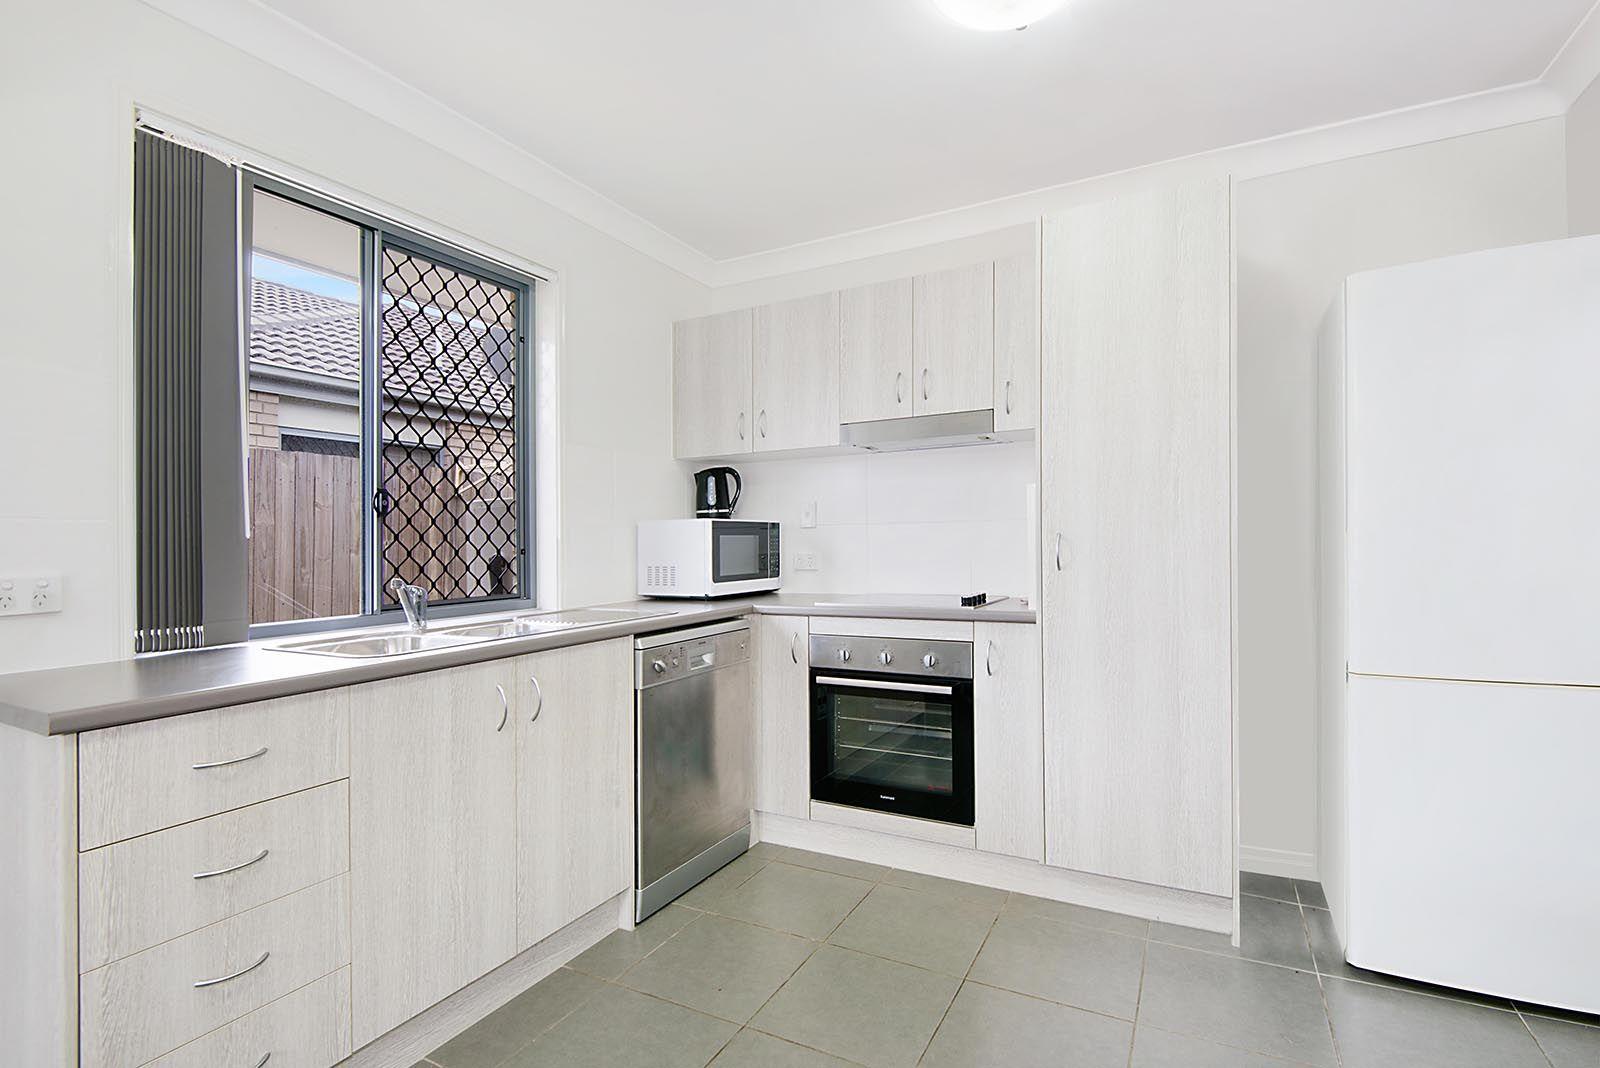 2/4 Bruce Baker Crescent, Crestmead QLD 4132, Image 2